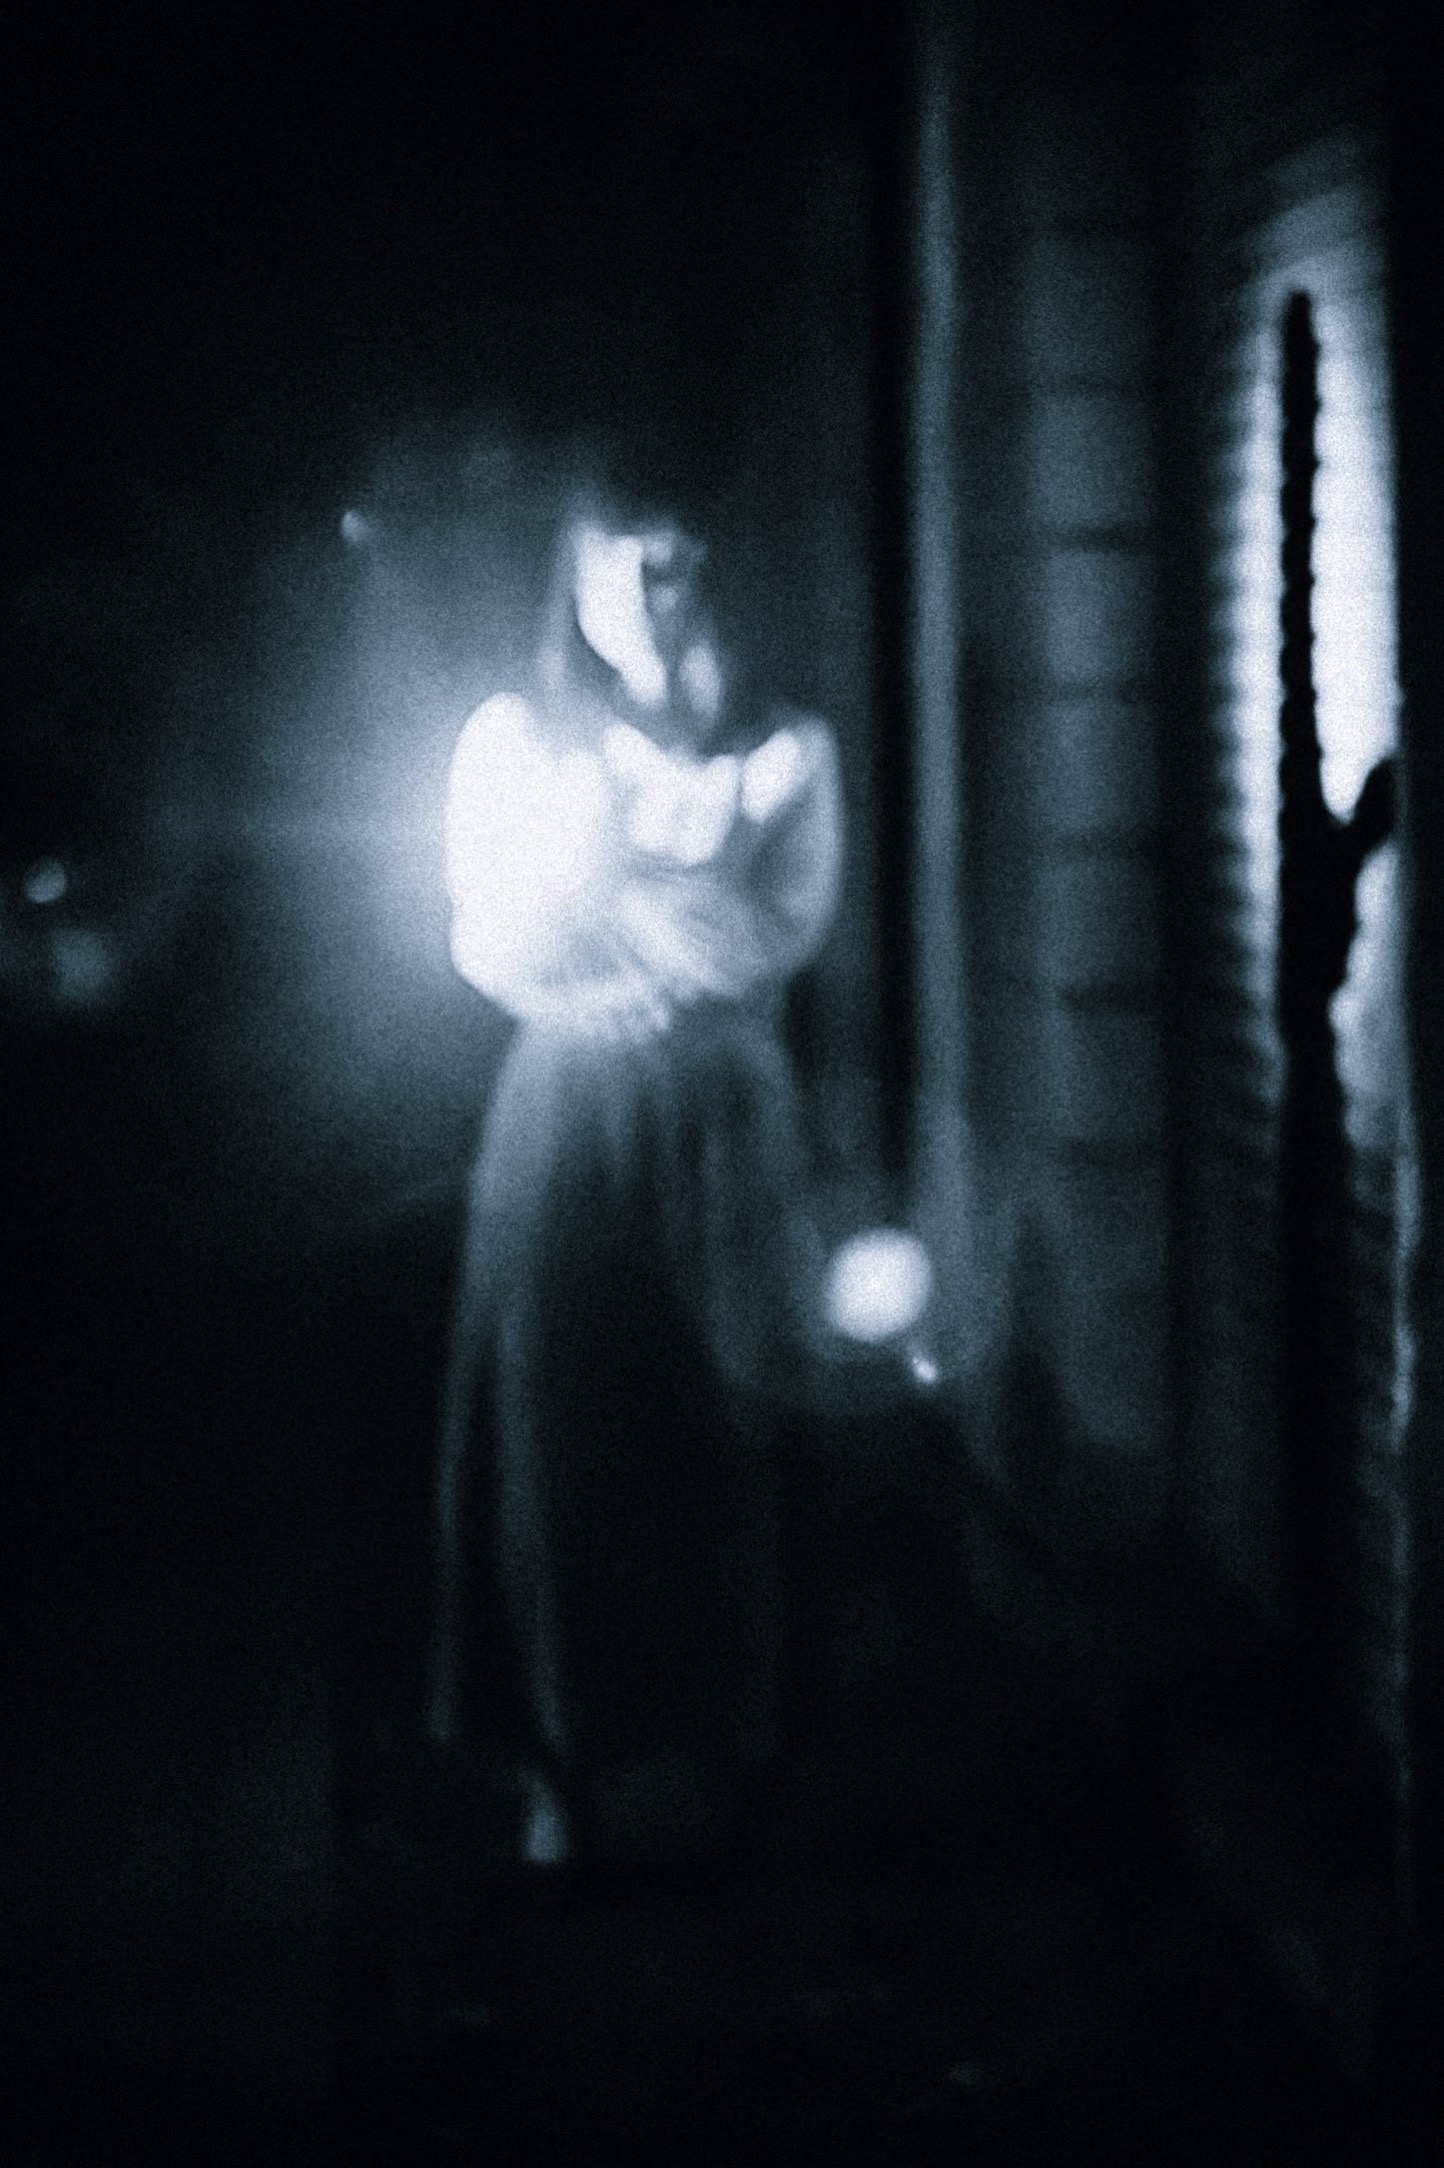 Pakutaso-Horror-Free-Stock-Photos-61.jpg